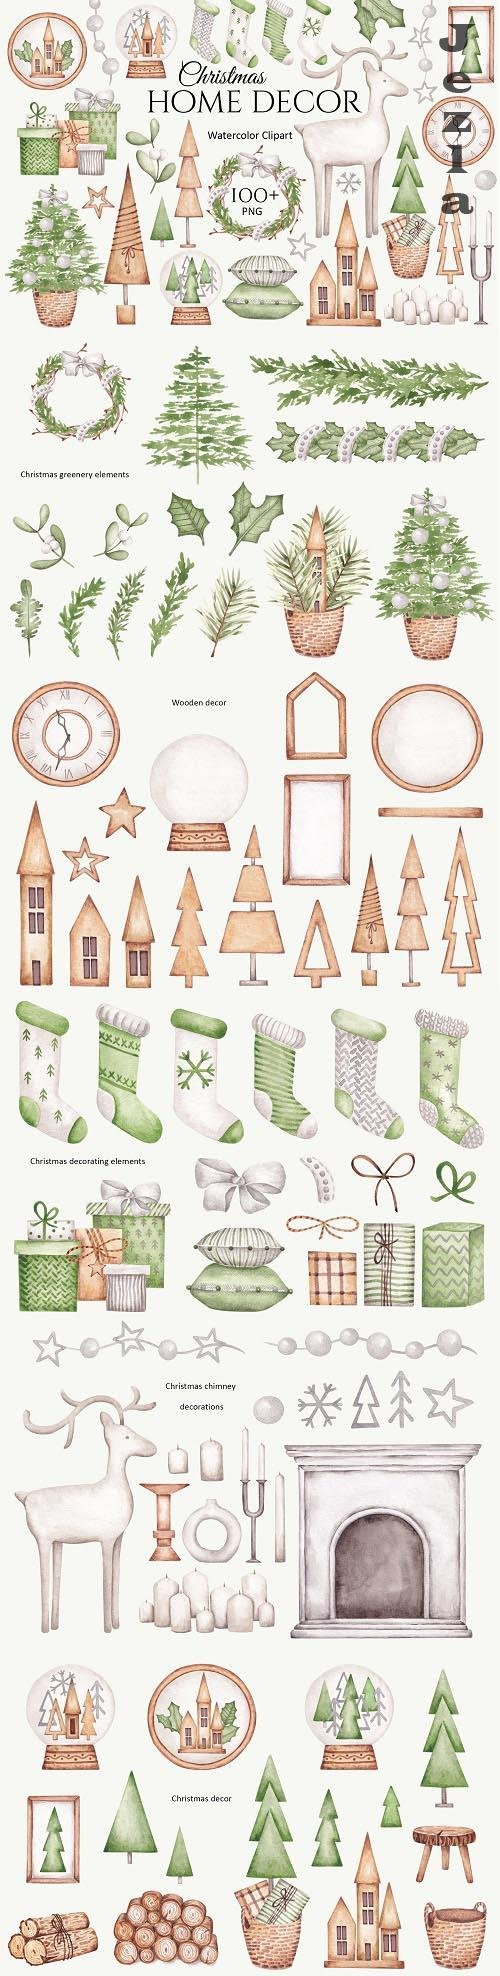 Watercolor Clipart Christmas Home Decor - 1614027